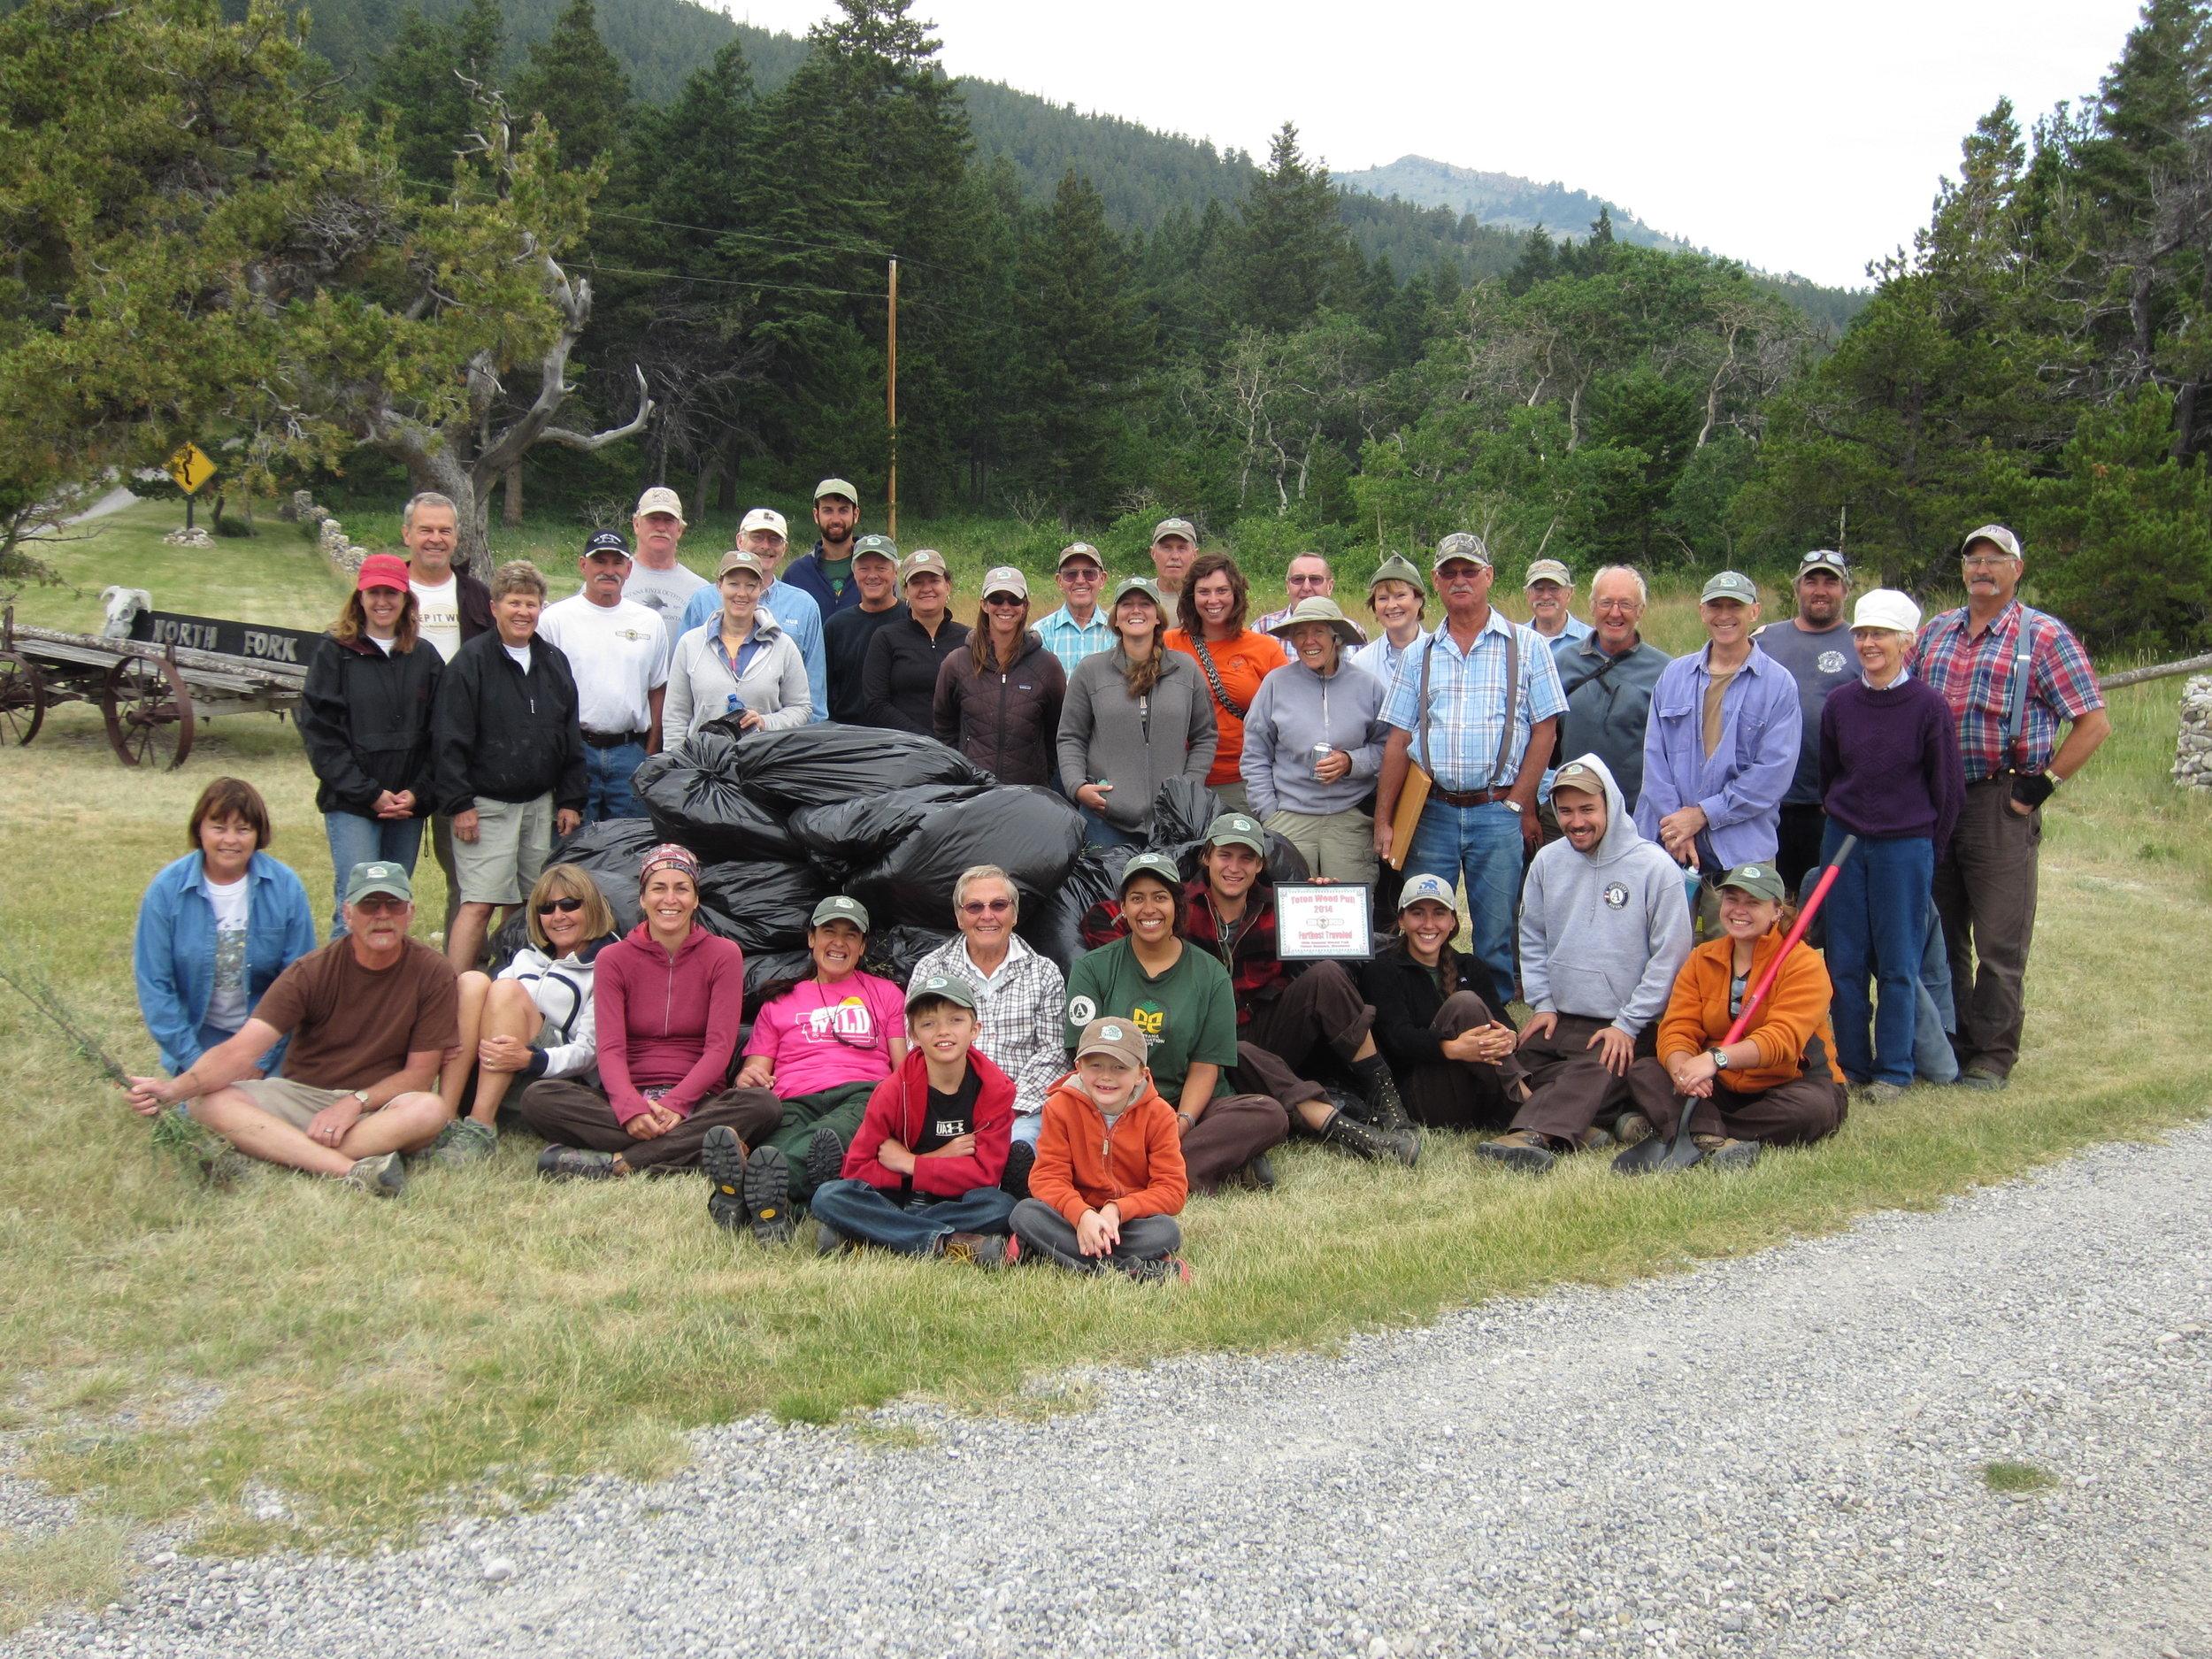 2014 Teton Weed Pull crew